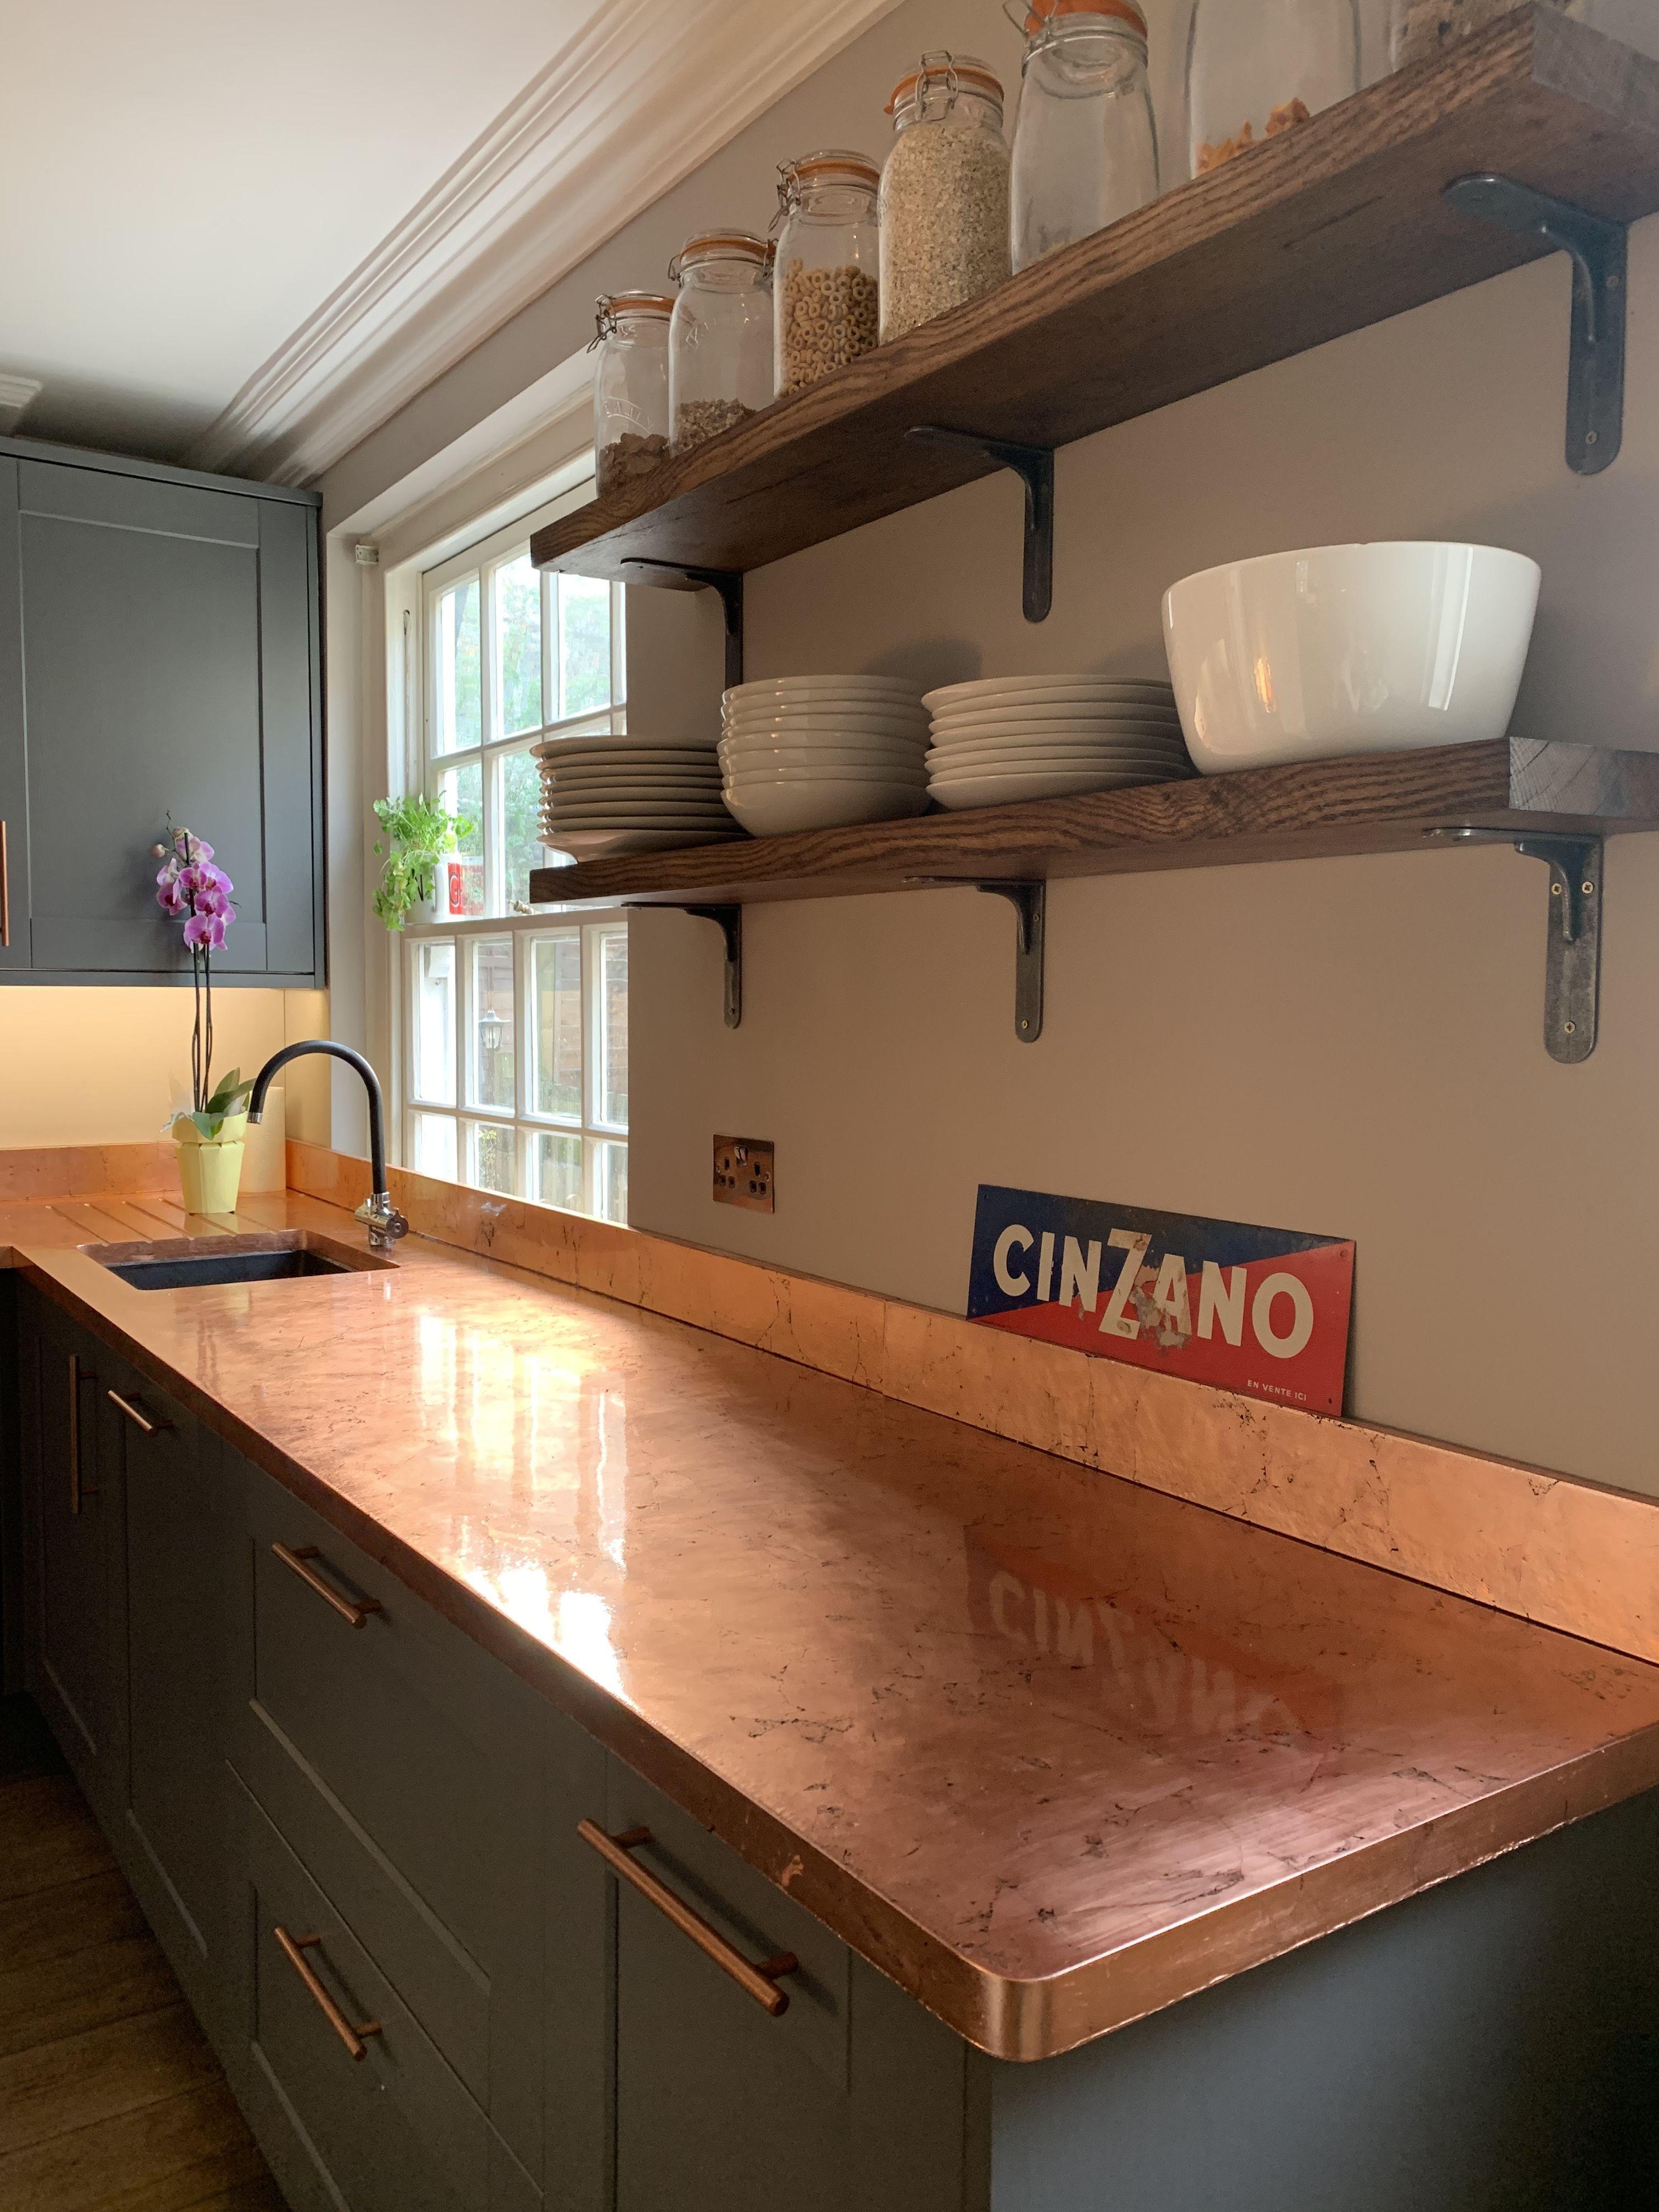 Copper Kitchen Counter Worktop Copper Counter Kitchen Worktop Diy Kitchen Remodel Kitchen Remodel Small Kitchen Worktop Makeover